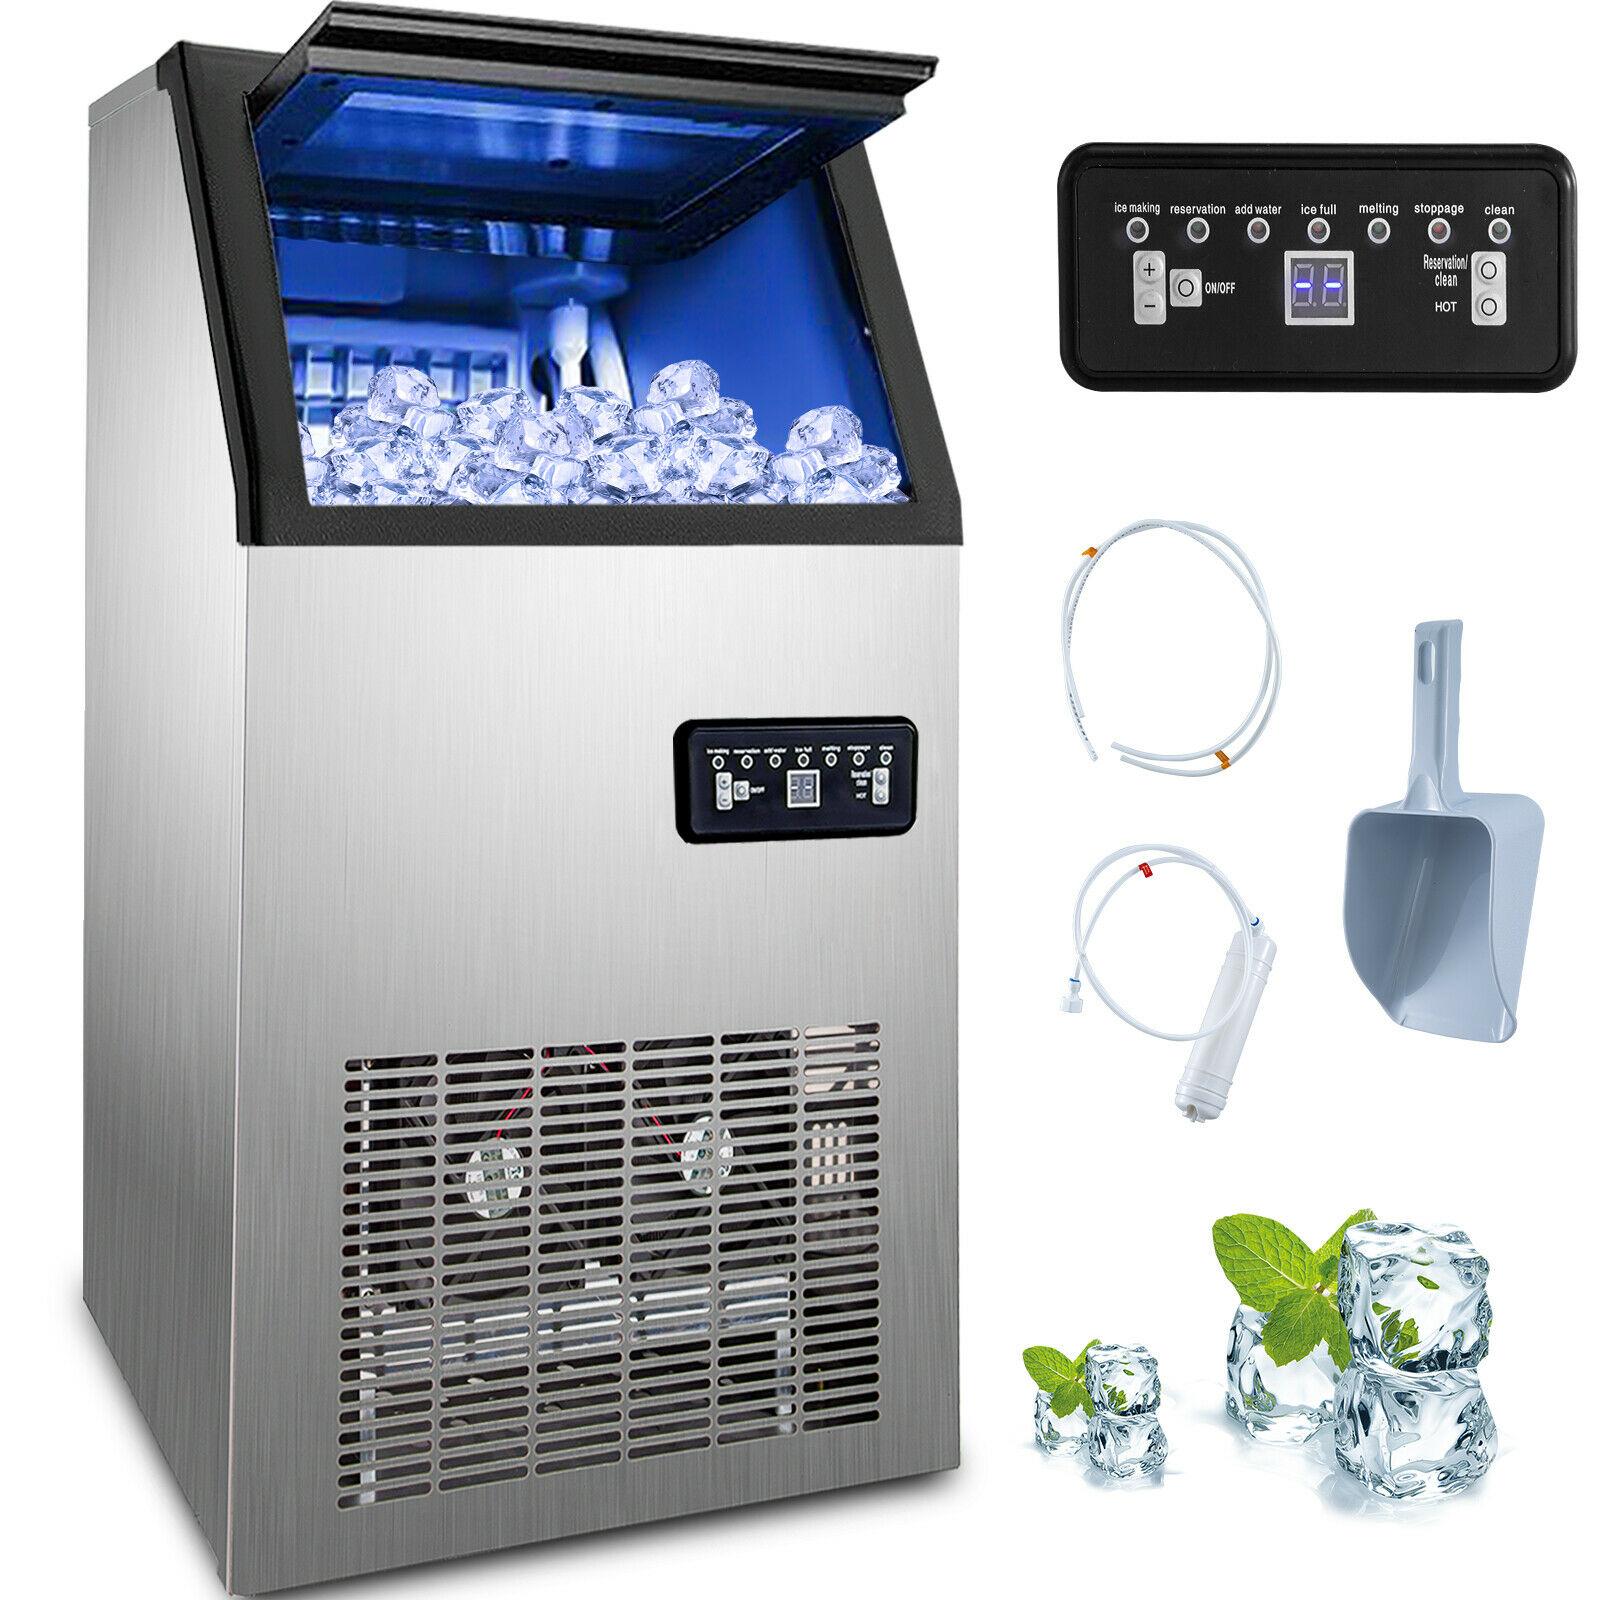 Commercial Ice Maker 50kg by 24H Ice Maker 230W 220V for cafes, parties, homes, restaurants, bars, hotels